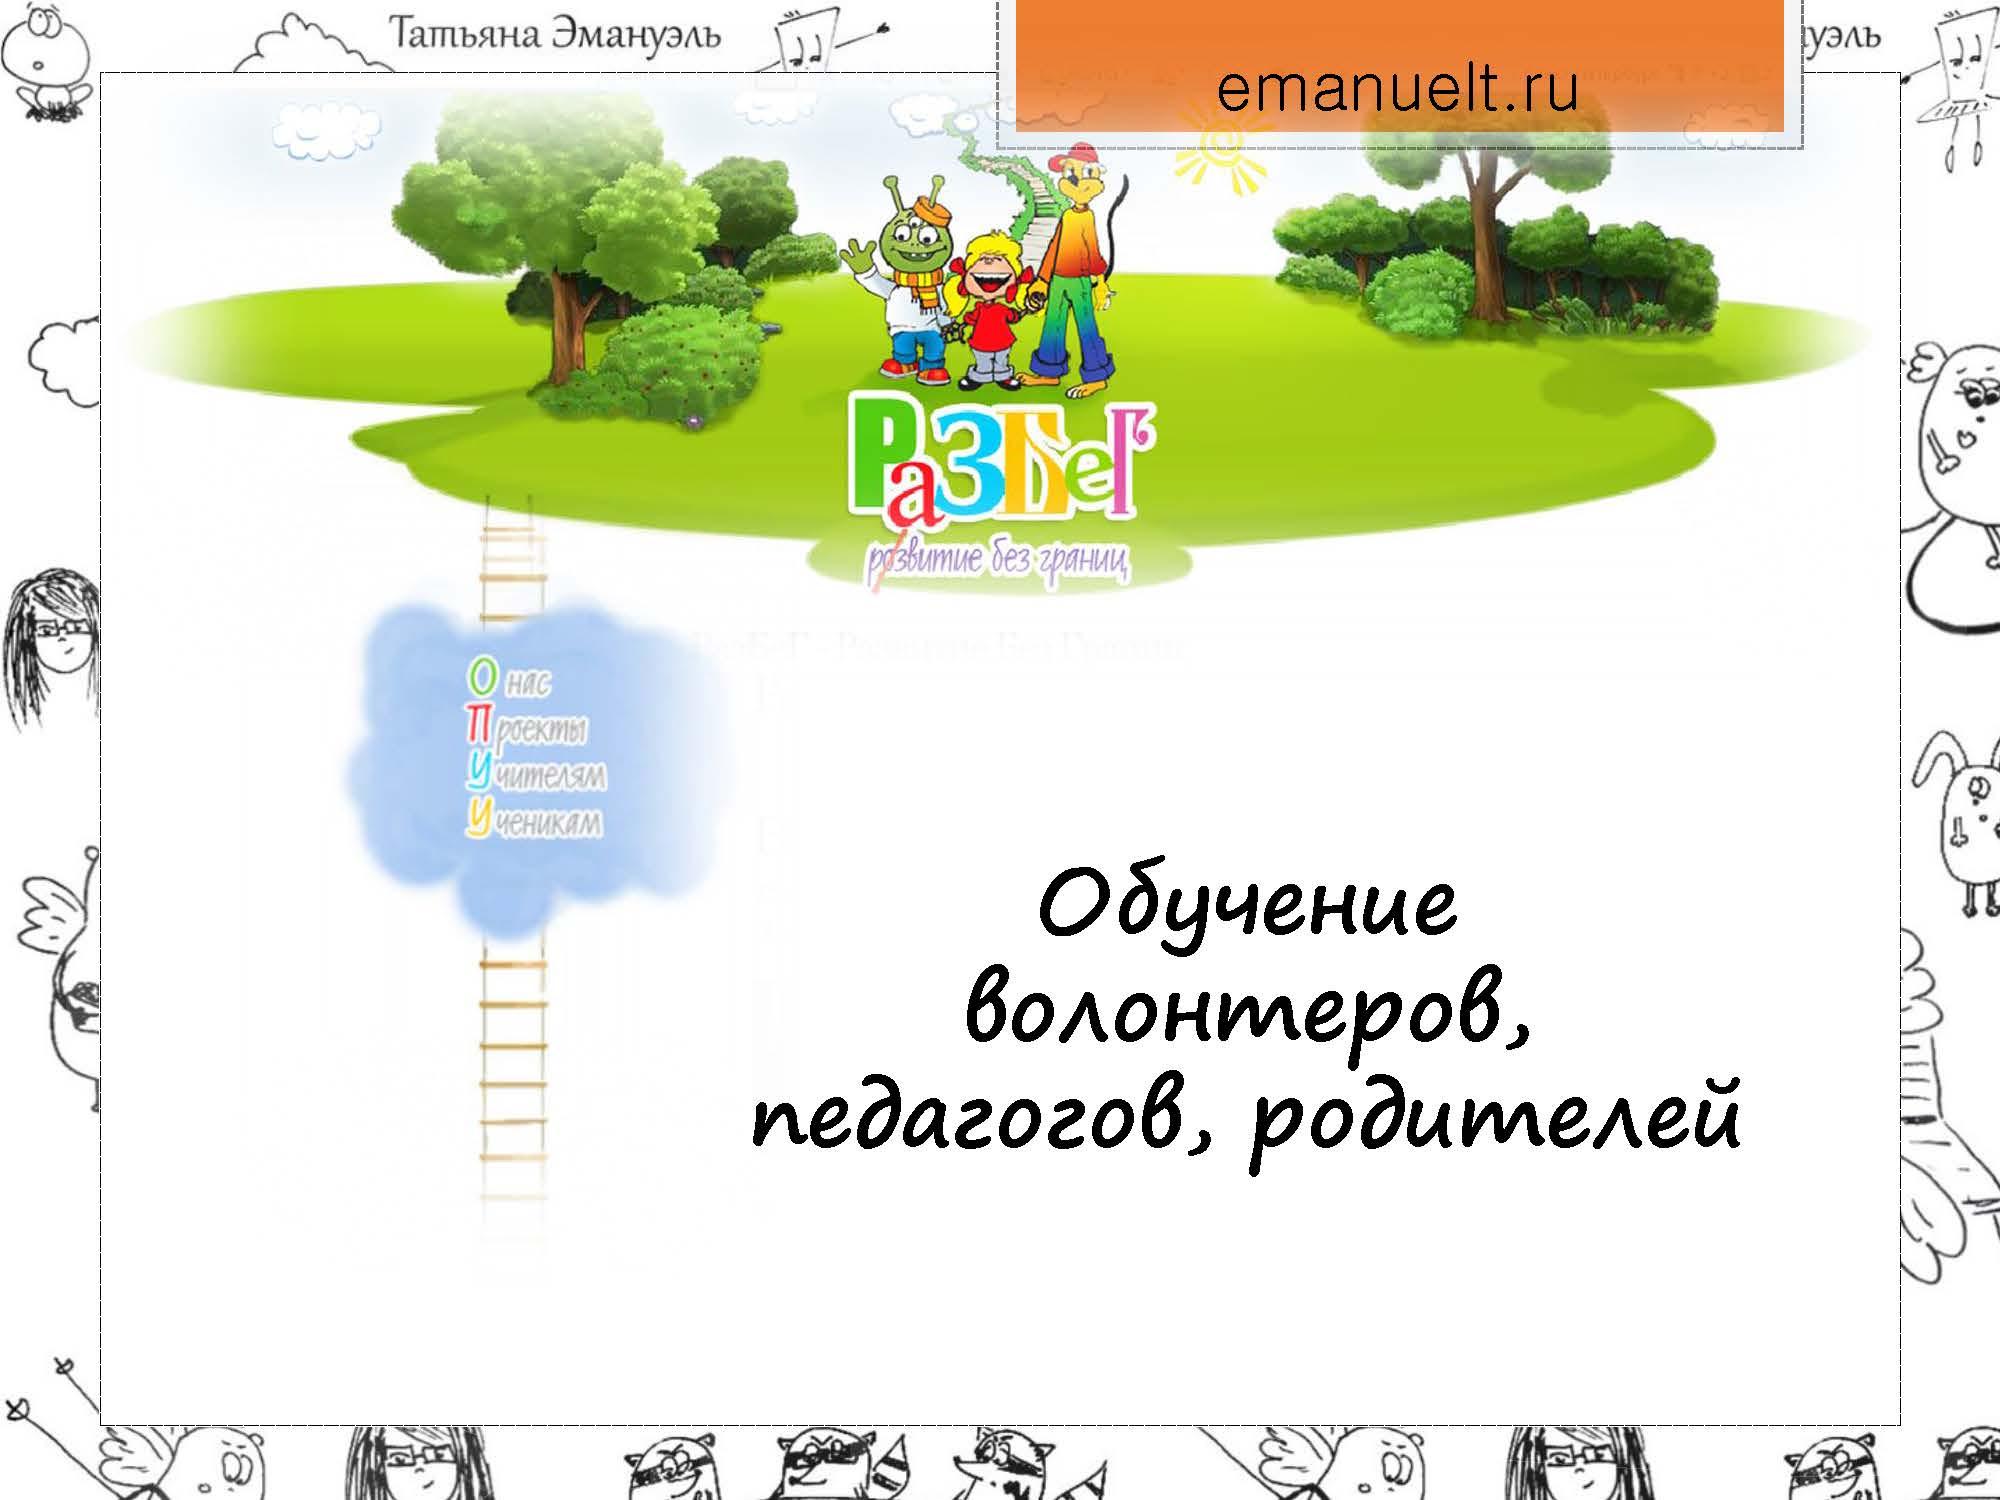 RazBeG_Emanuel_Страница_28